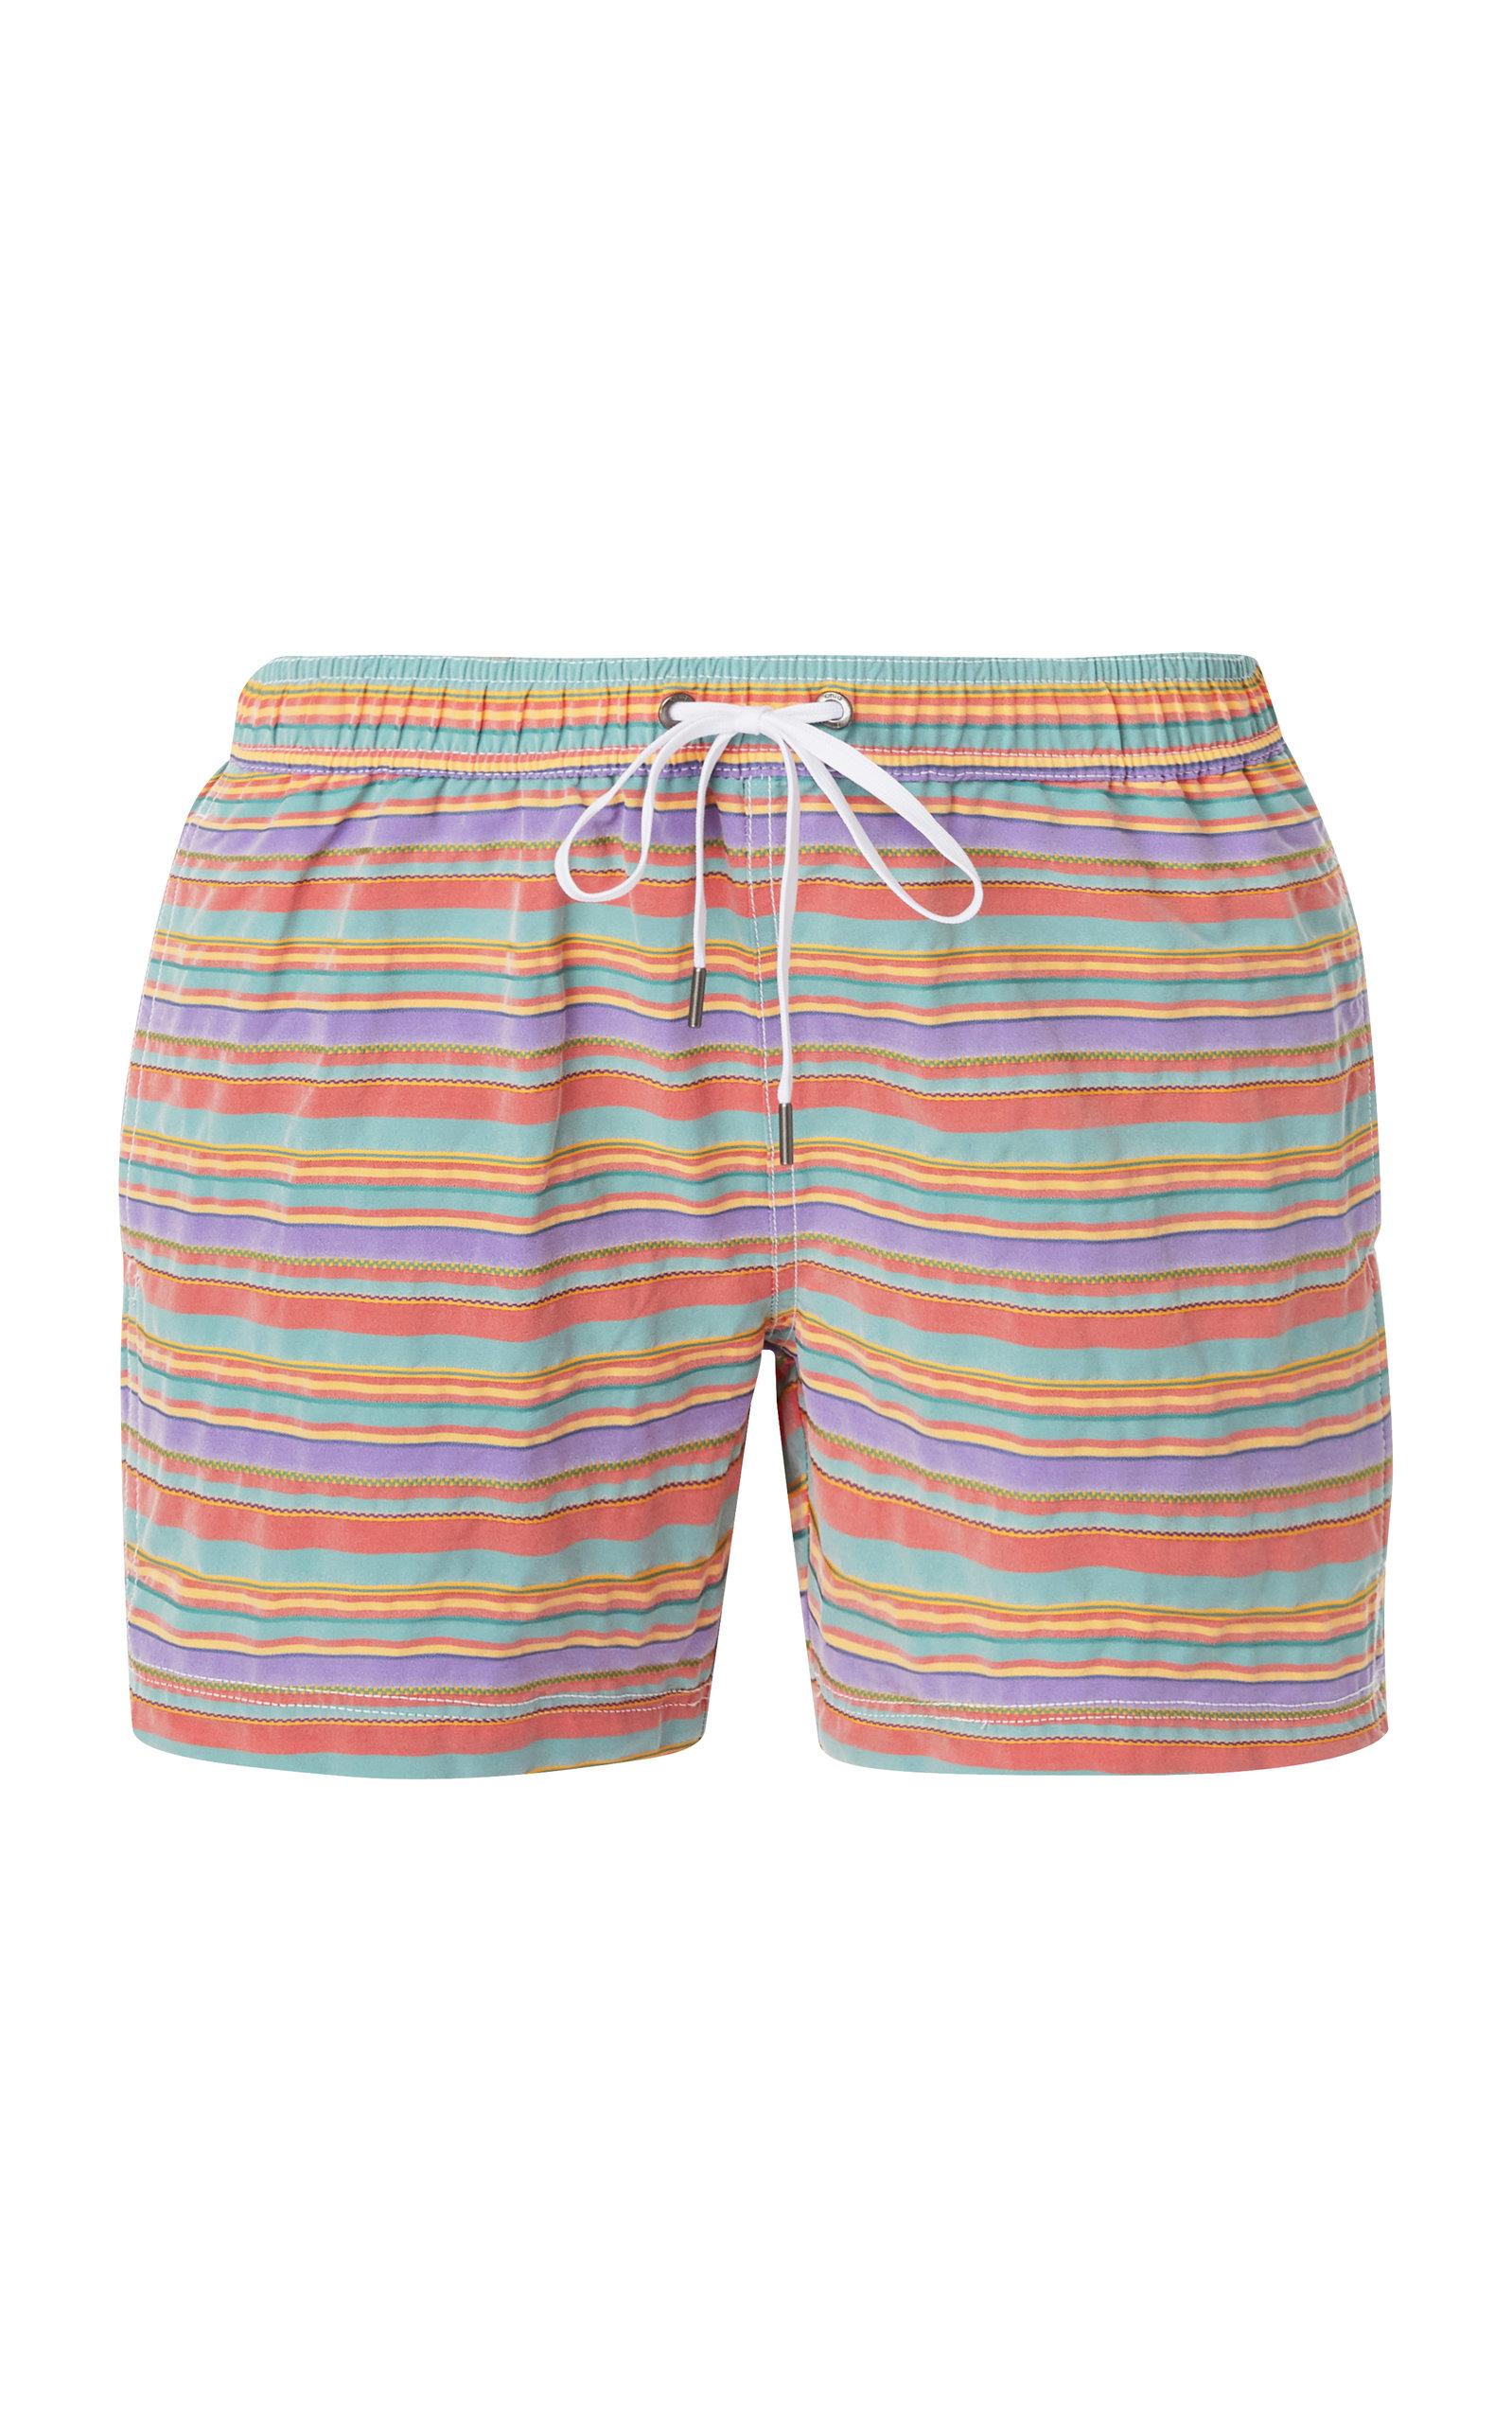 766b1702b0c02 Charles Striped Swim Trunks by Onia | Moda Operandi